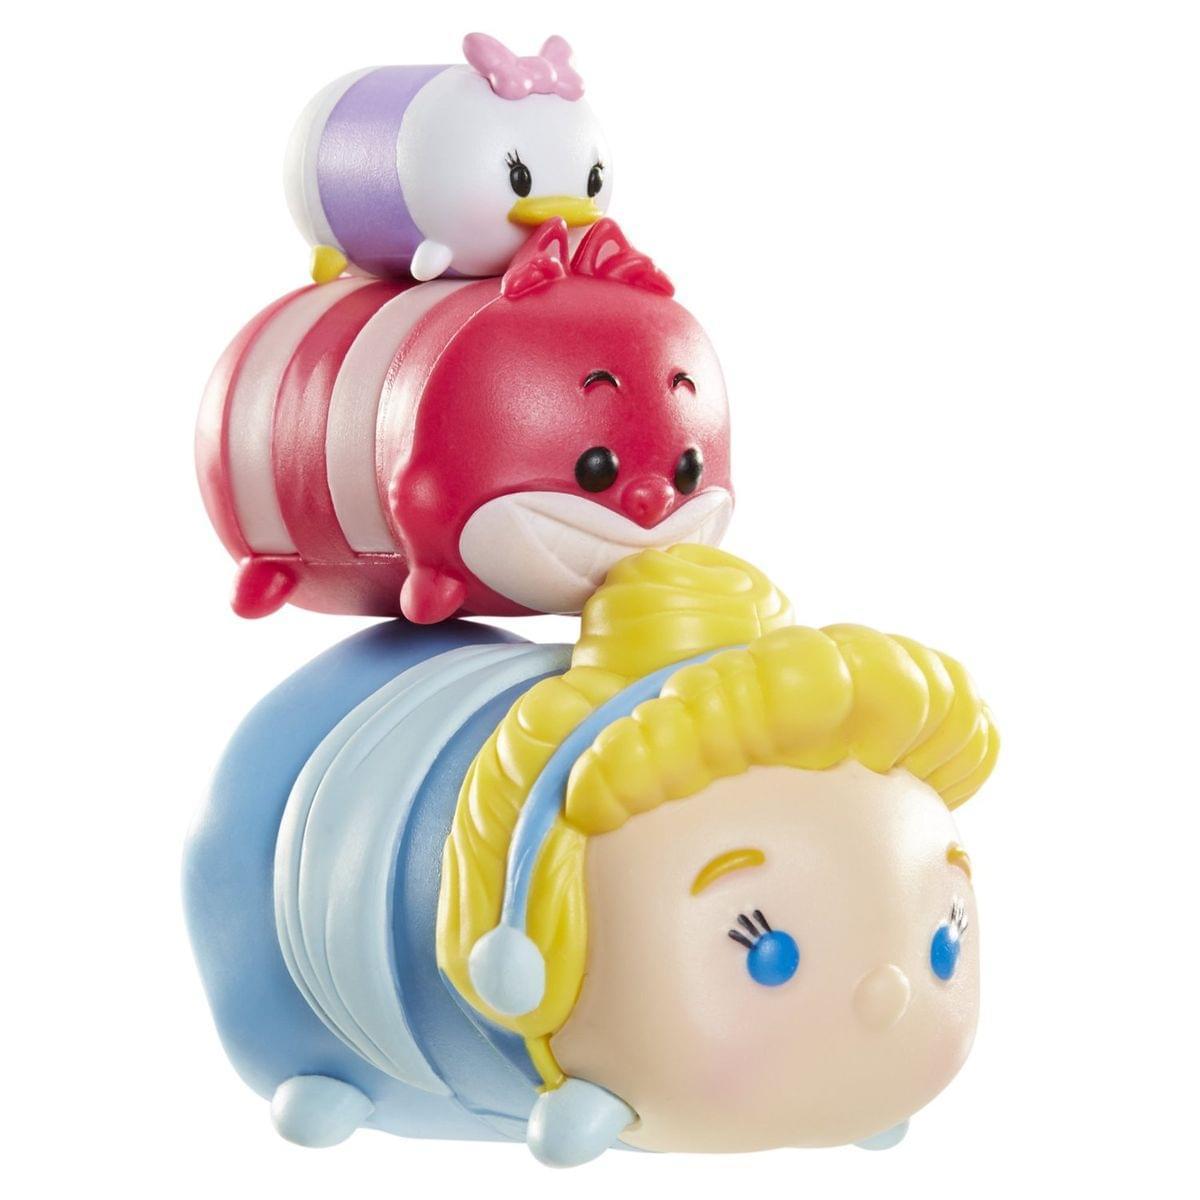 Disney Tsum Tsum Series 1 Daisy, Cheshire Cat & Cinderella Minifigure 3-Pack